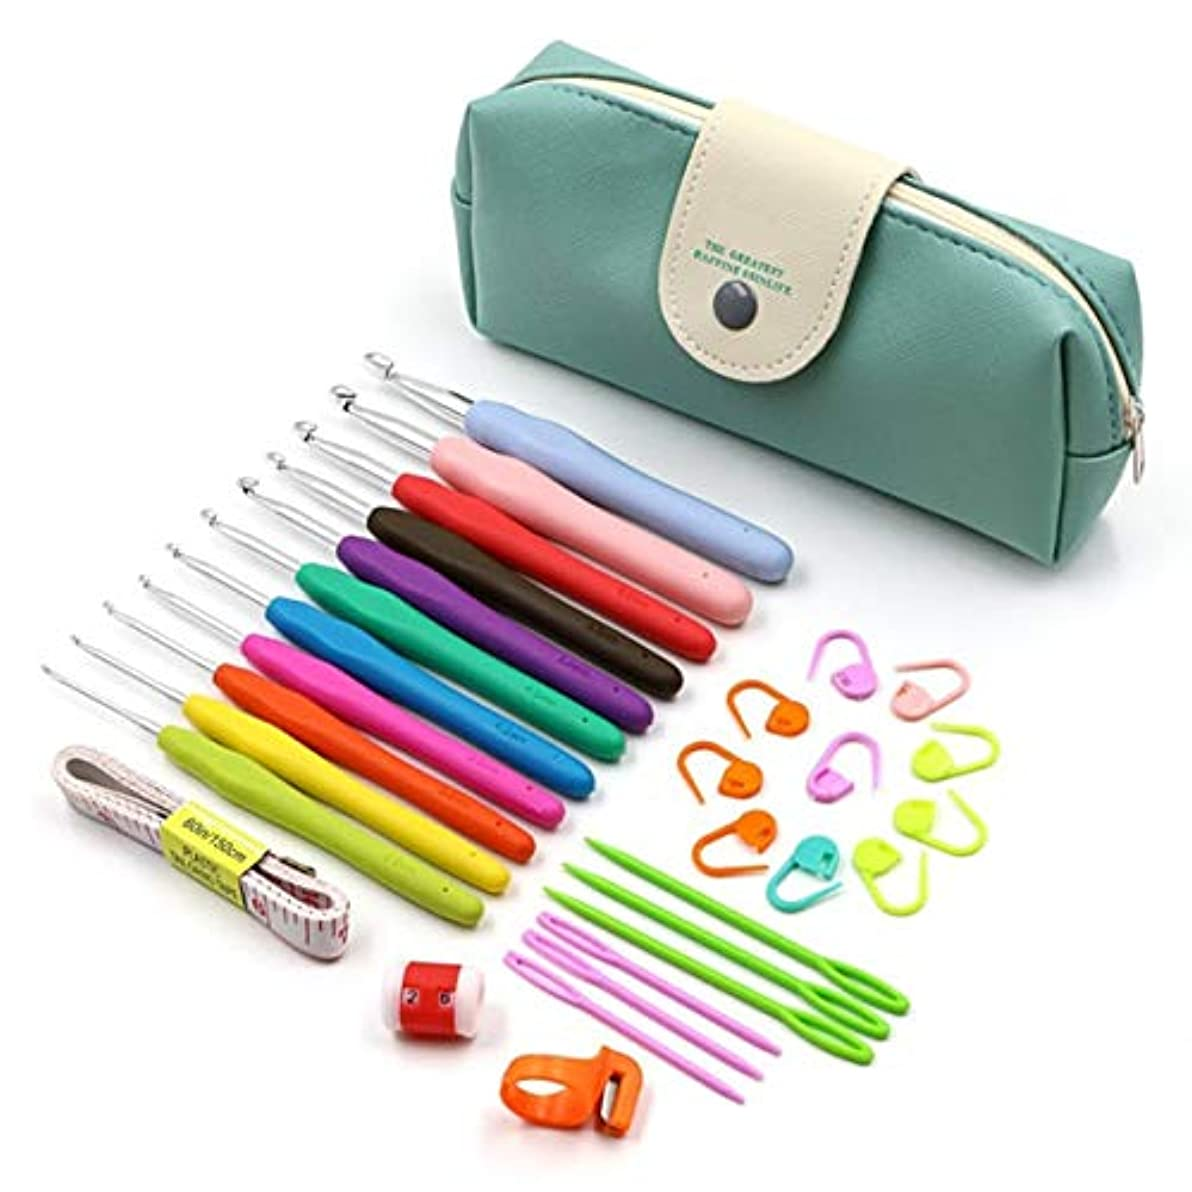 Saikogoods ソフトハンドル 収納袋付きアルミかぎ針編みのフックキット 糸編み物針 裁縫ツール 人間工学に基づいたグリップセット 多色